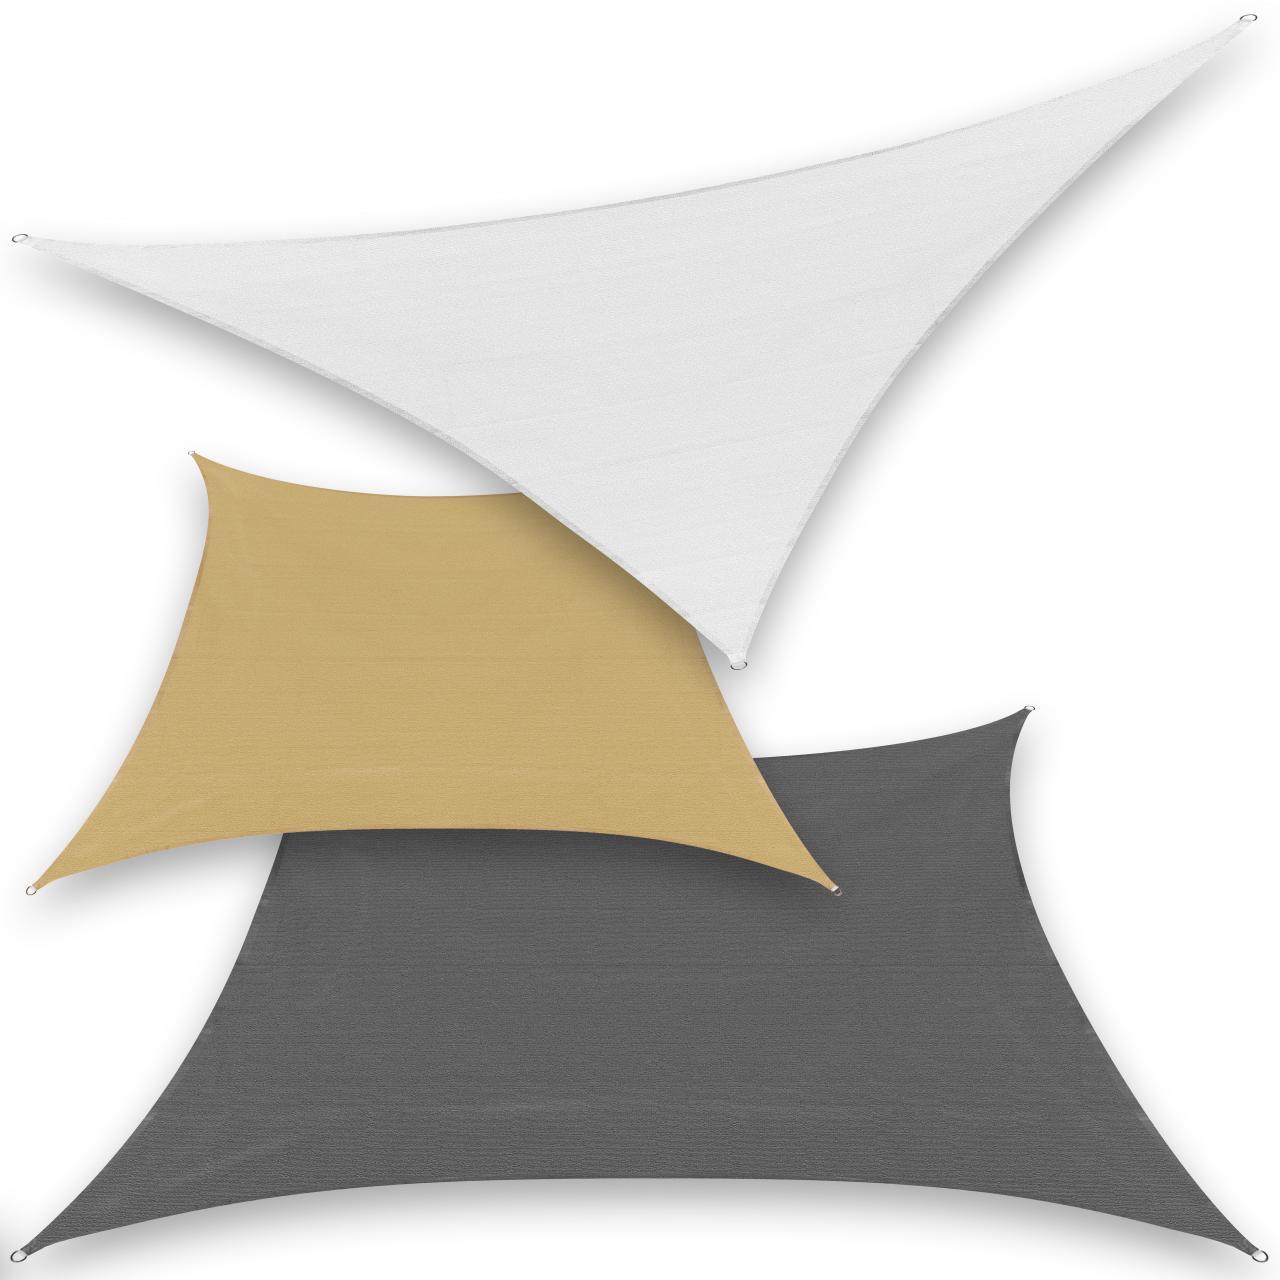 sonnensegel sonnenschutz garten sonnendach uv schutz beschattung dreieck viereck ebay. Black Bedroom Furniture Sets. Home Design Ideas